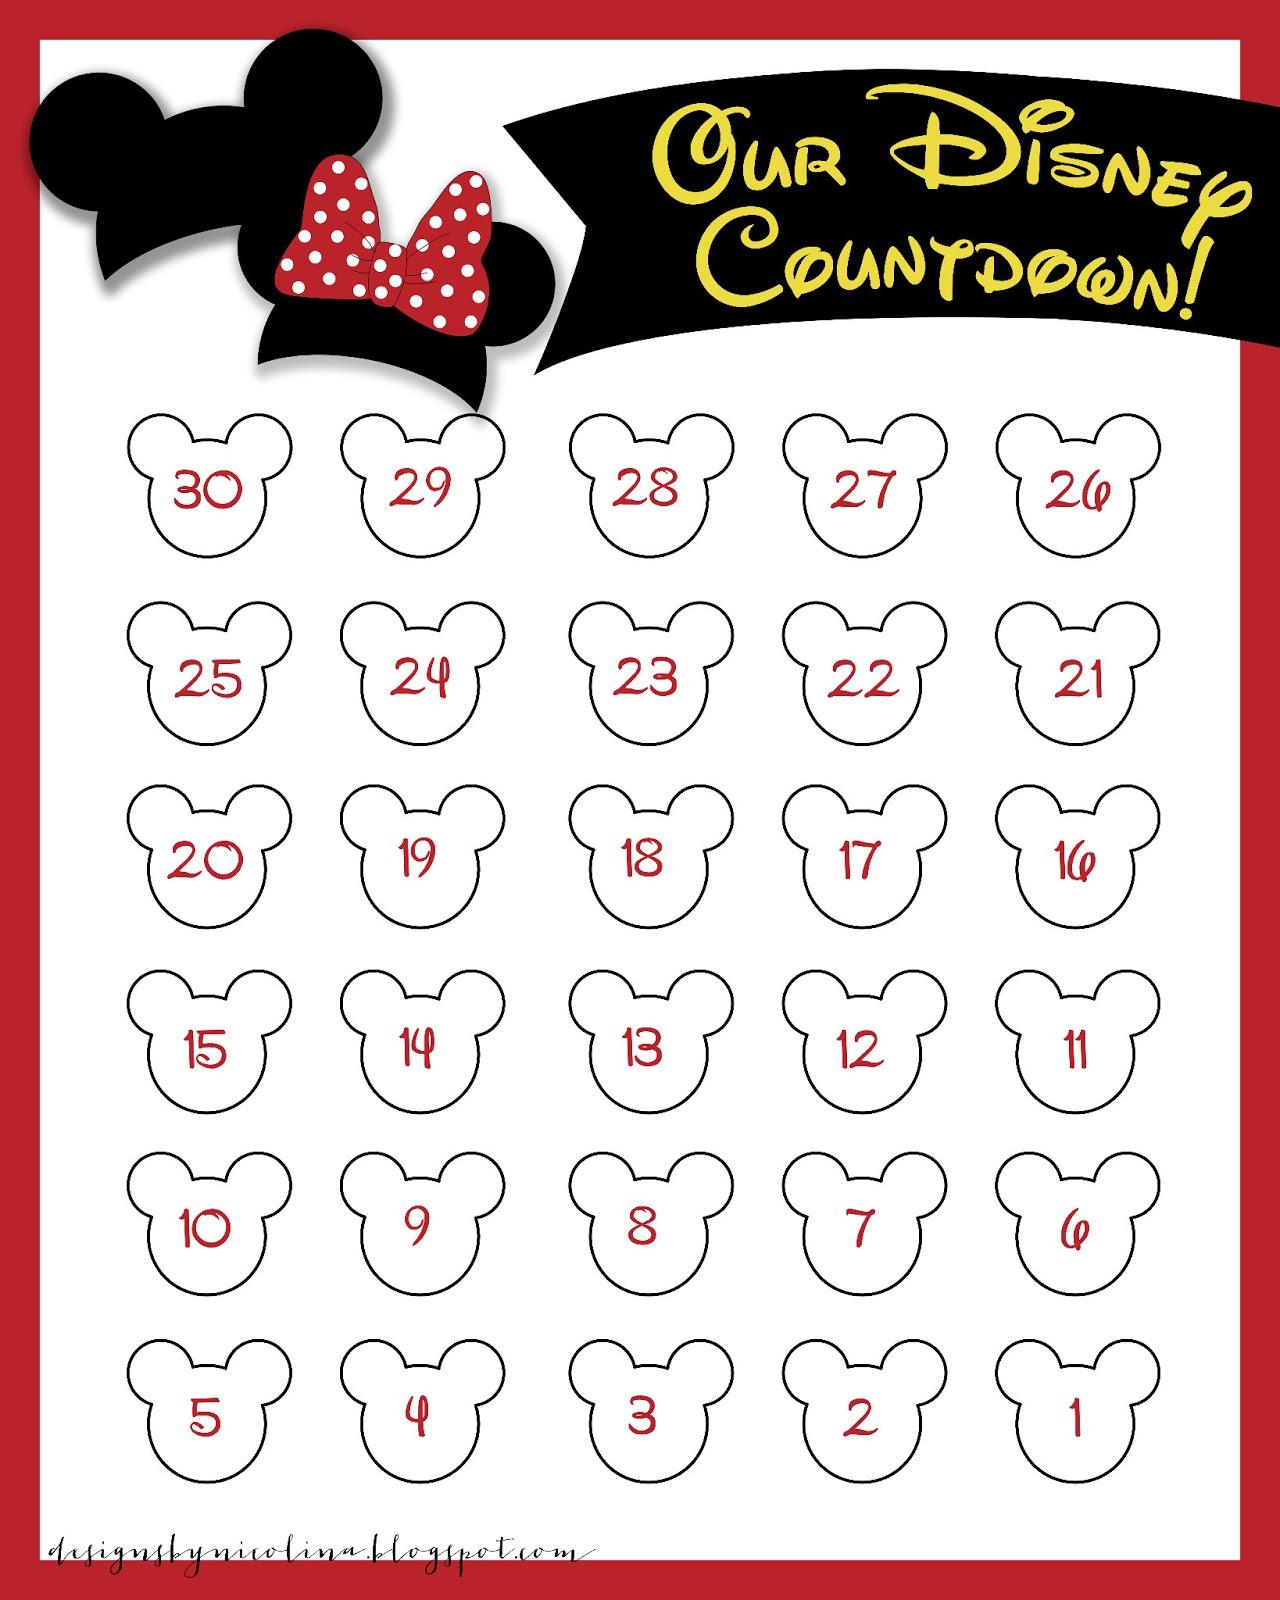 Disney World Countdown Calendar Printable